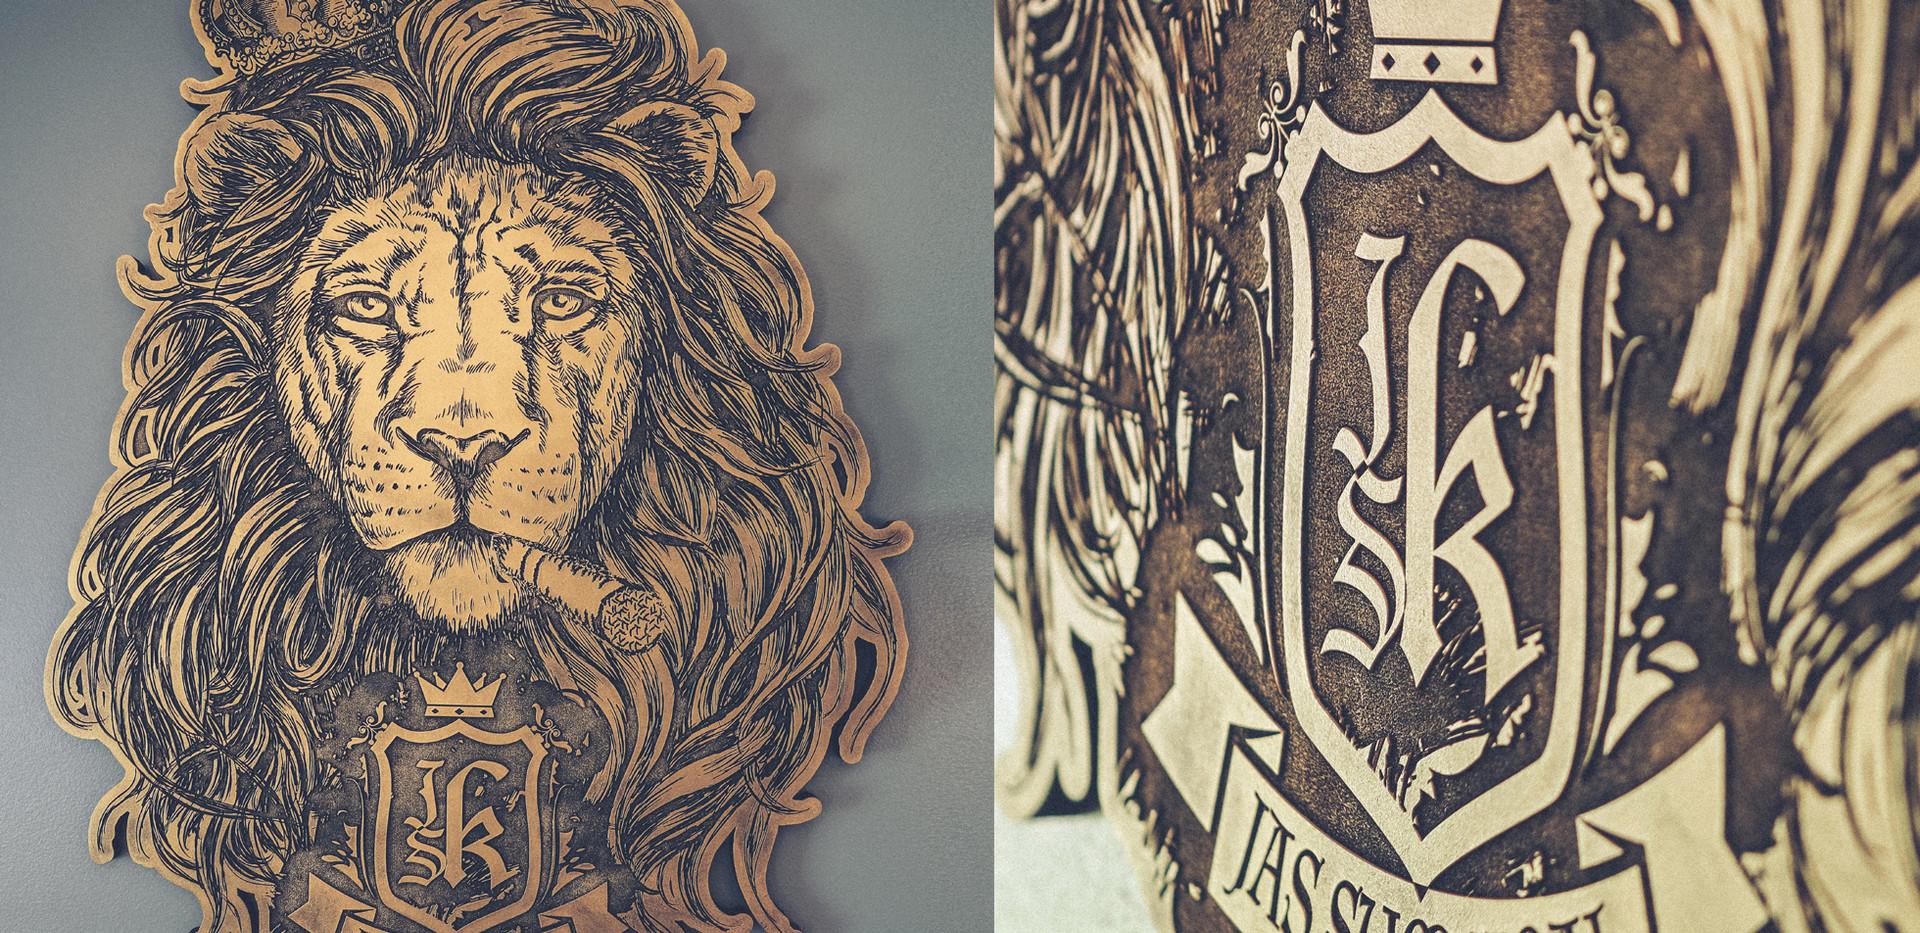 JSK Lion.jpg